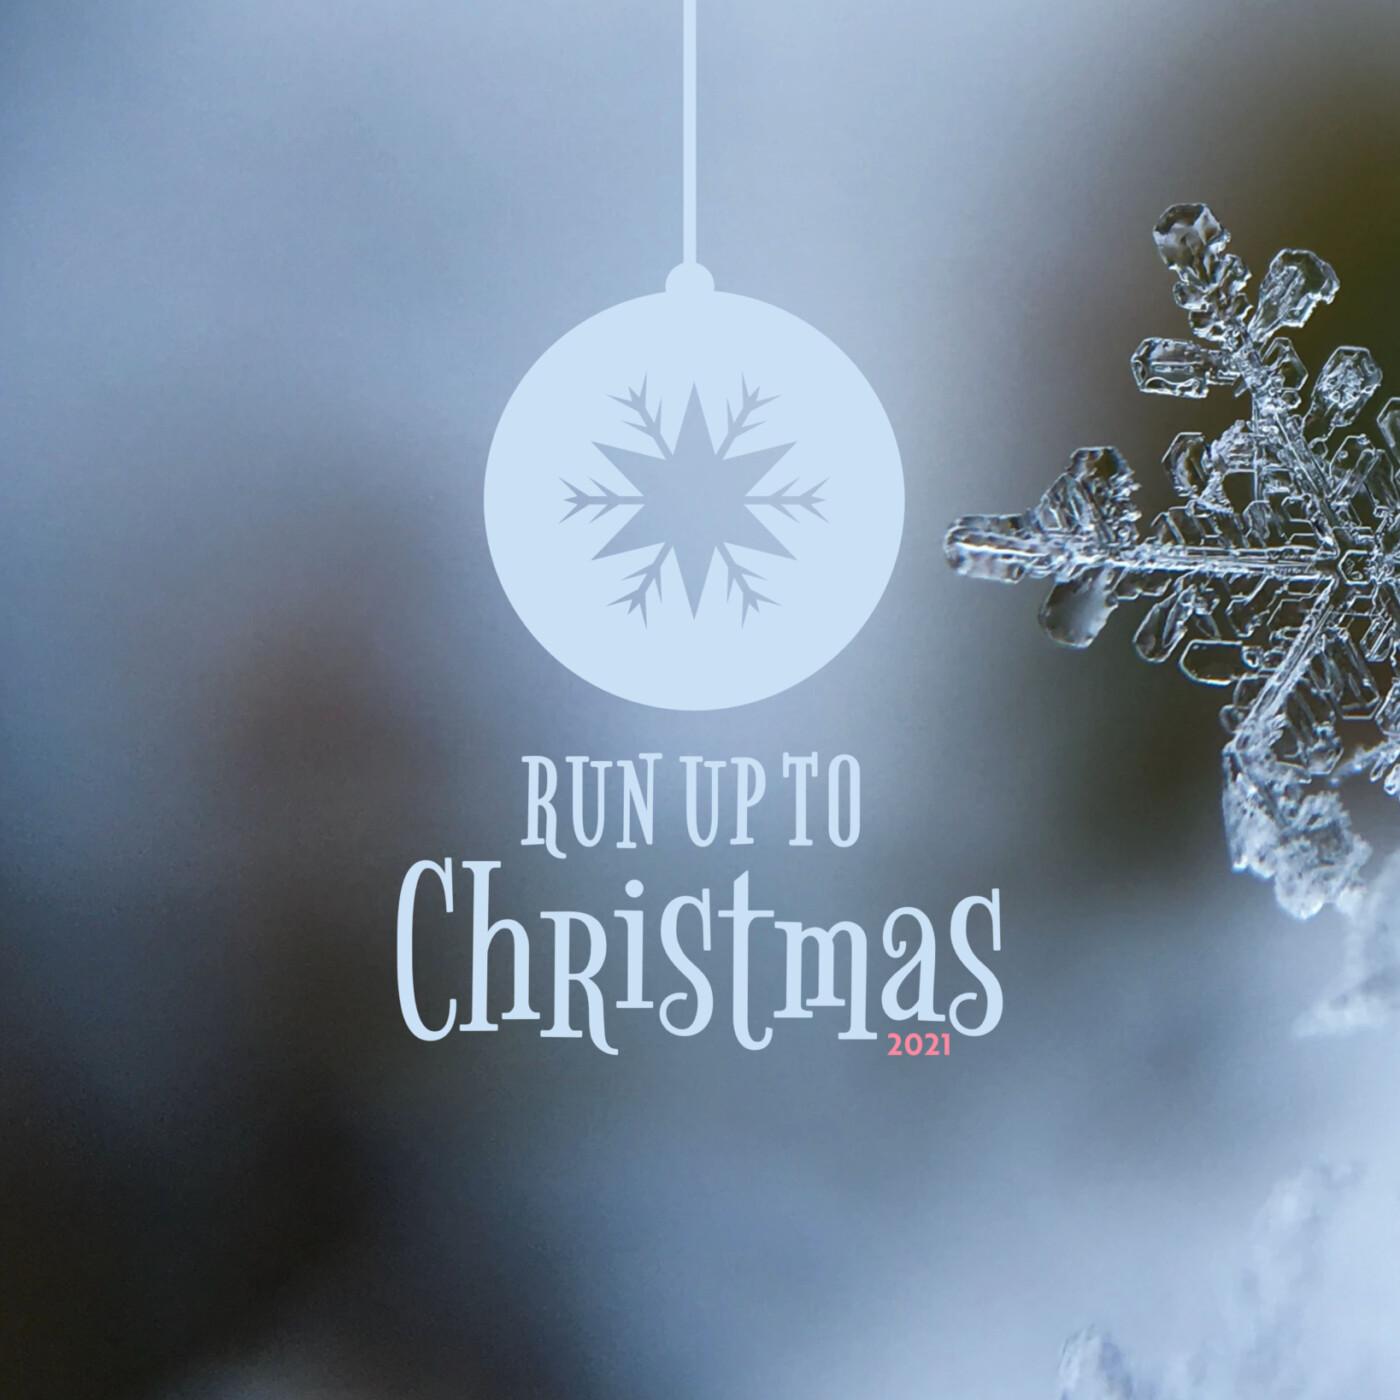 Run Up2 Christmas Header